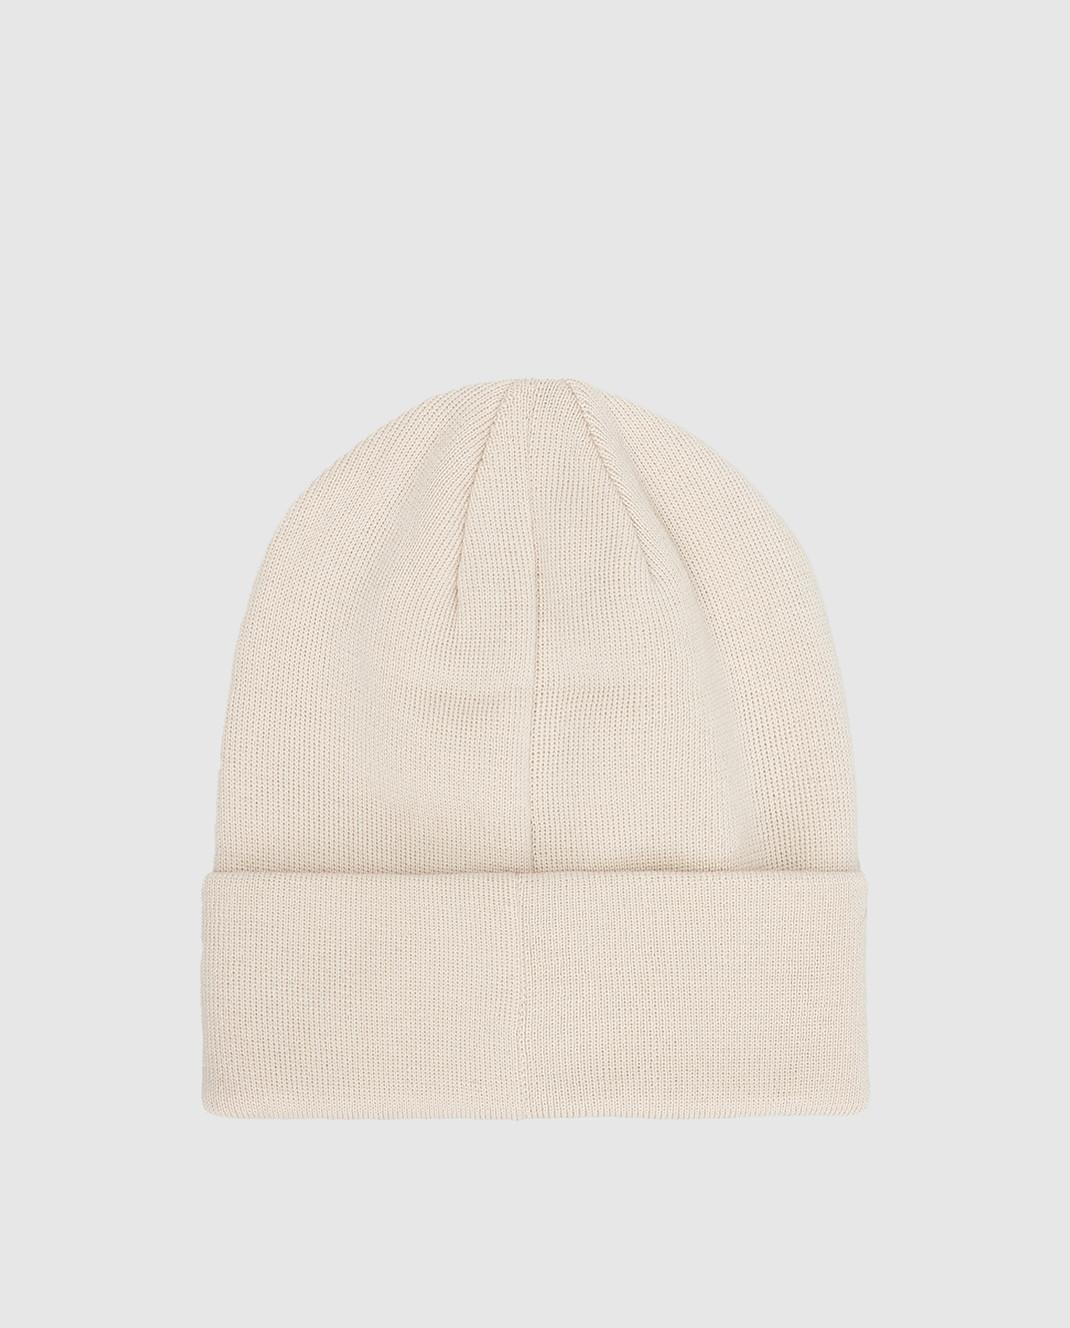 Il Trenino Детская светло-бежевая шапка из шерсти изображение 2